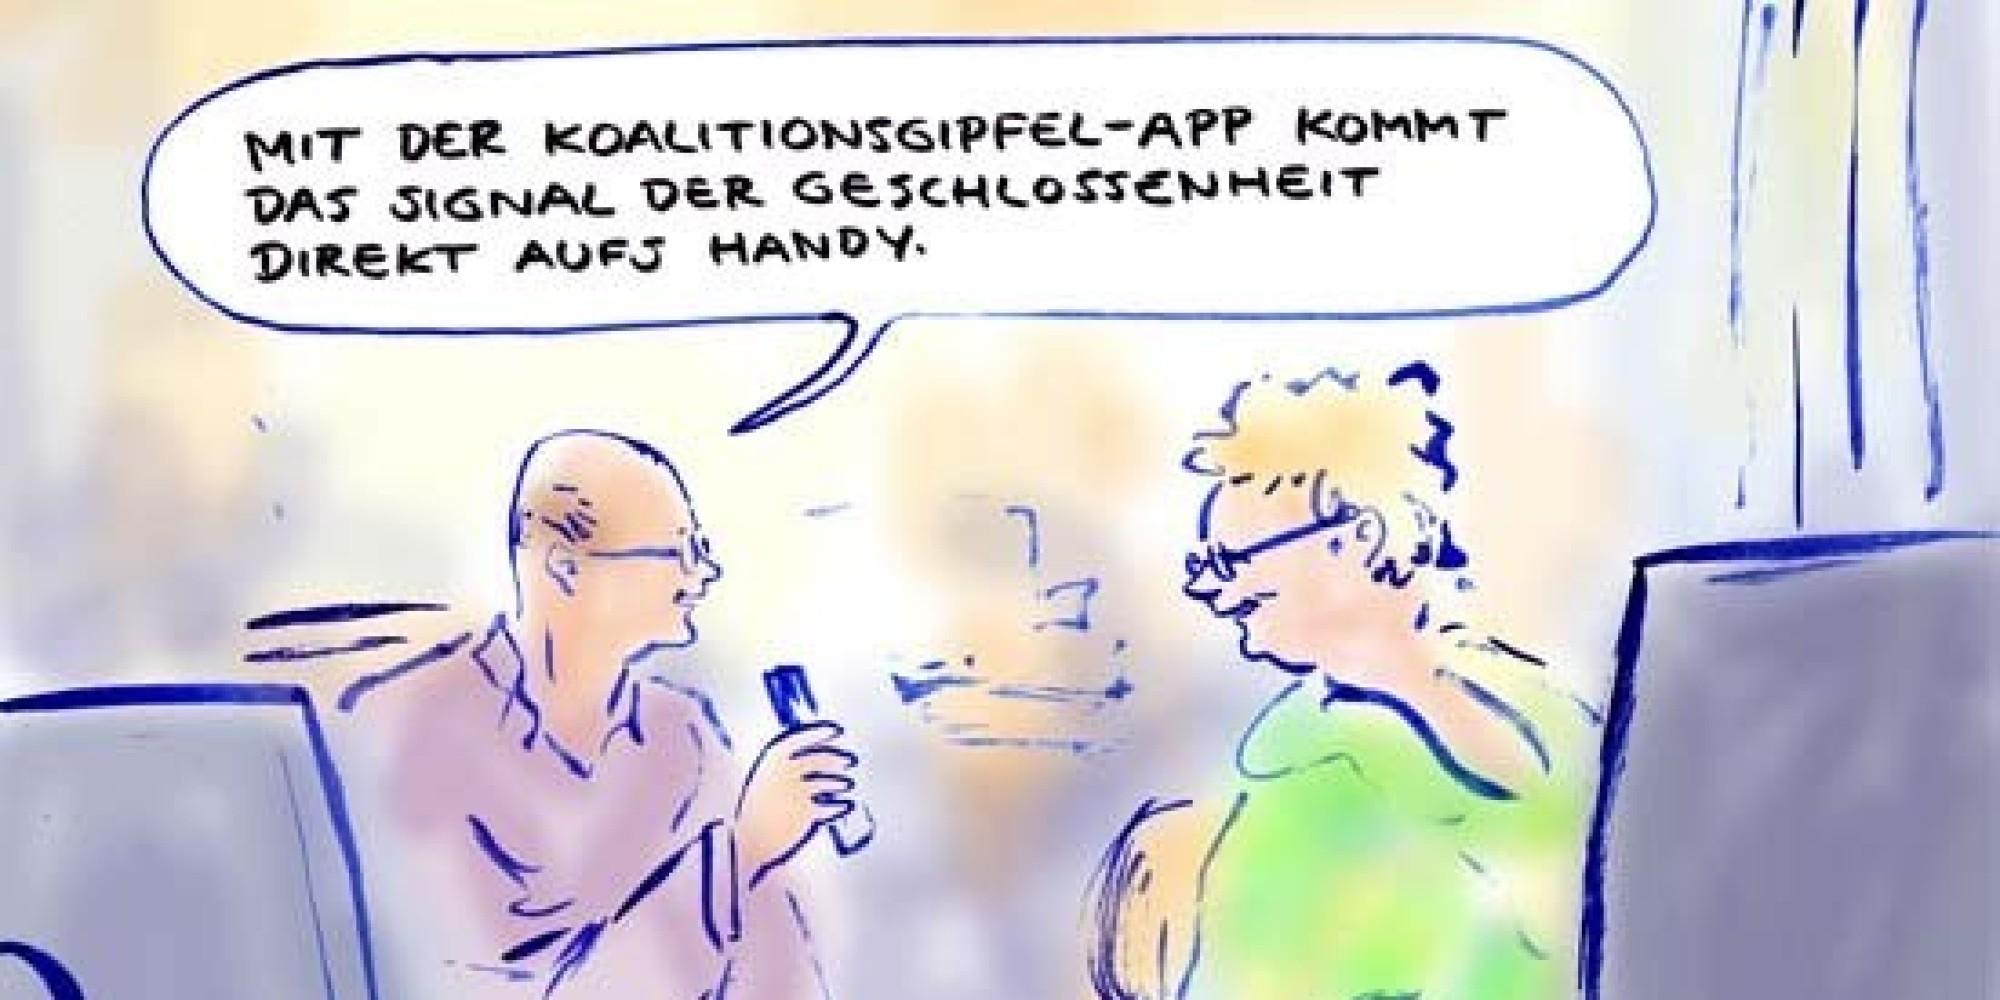 sex villingen schwenningen flohmarkt ostalbkreis